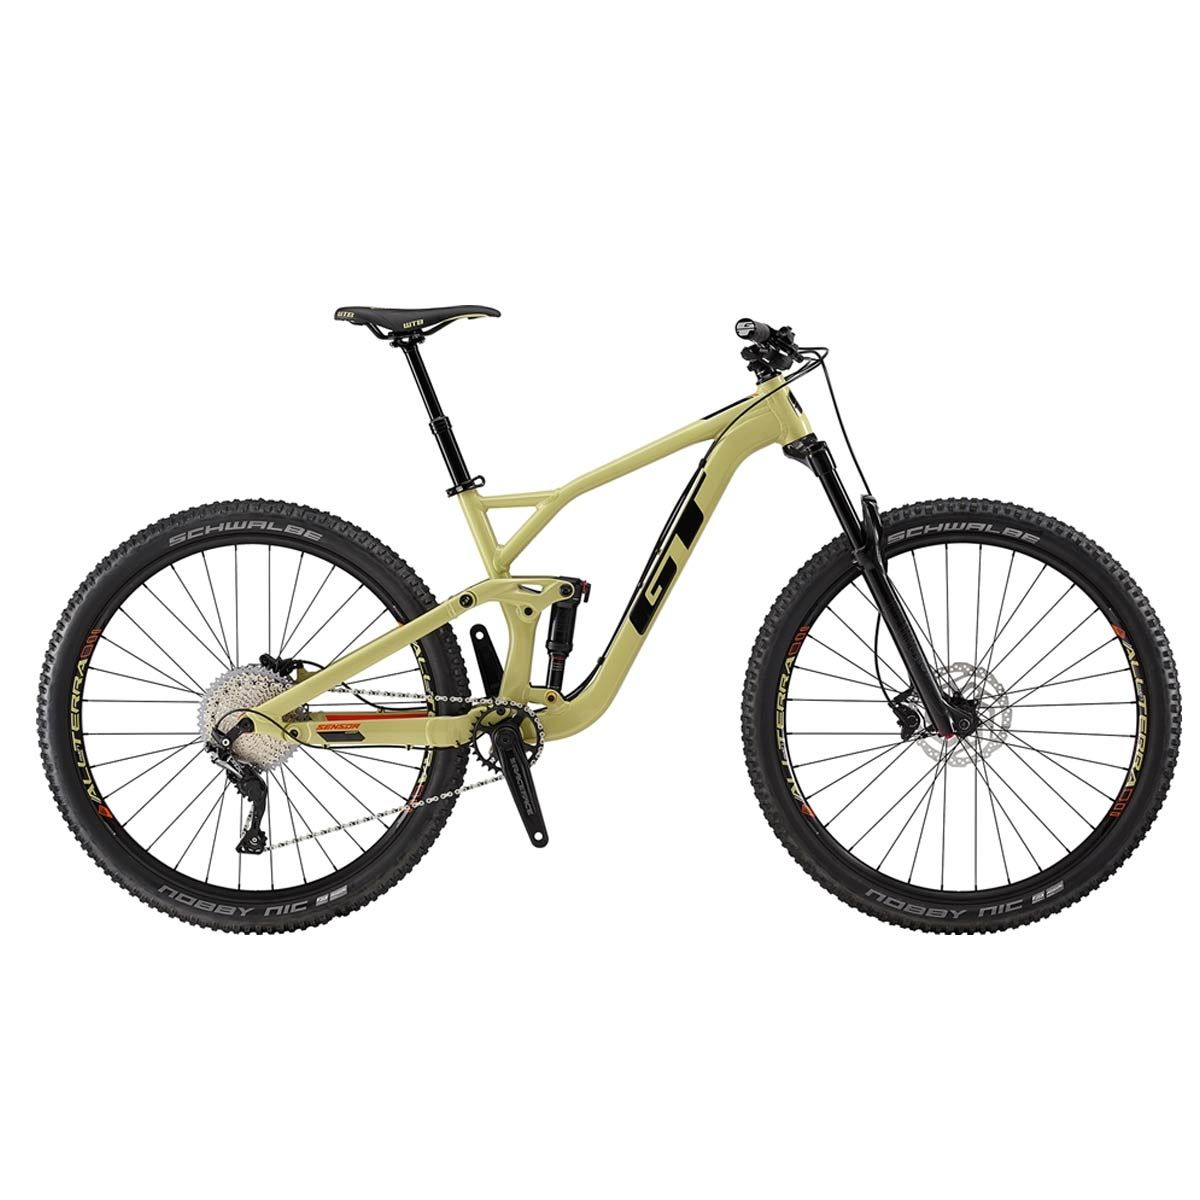 GT Bicycles Sensor Alloy Comp 2019 Mountain Bike